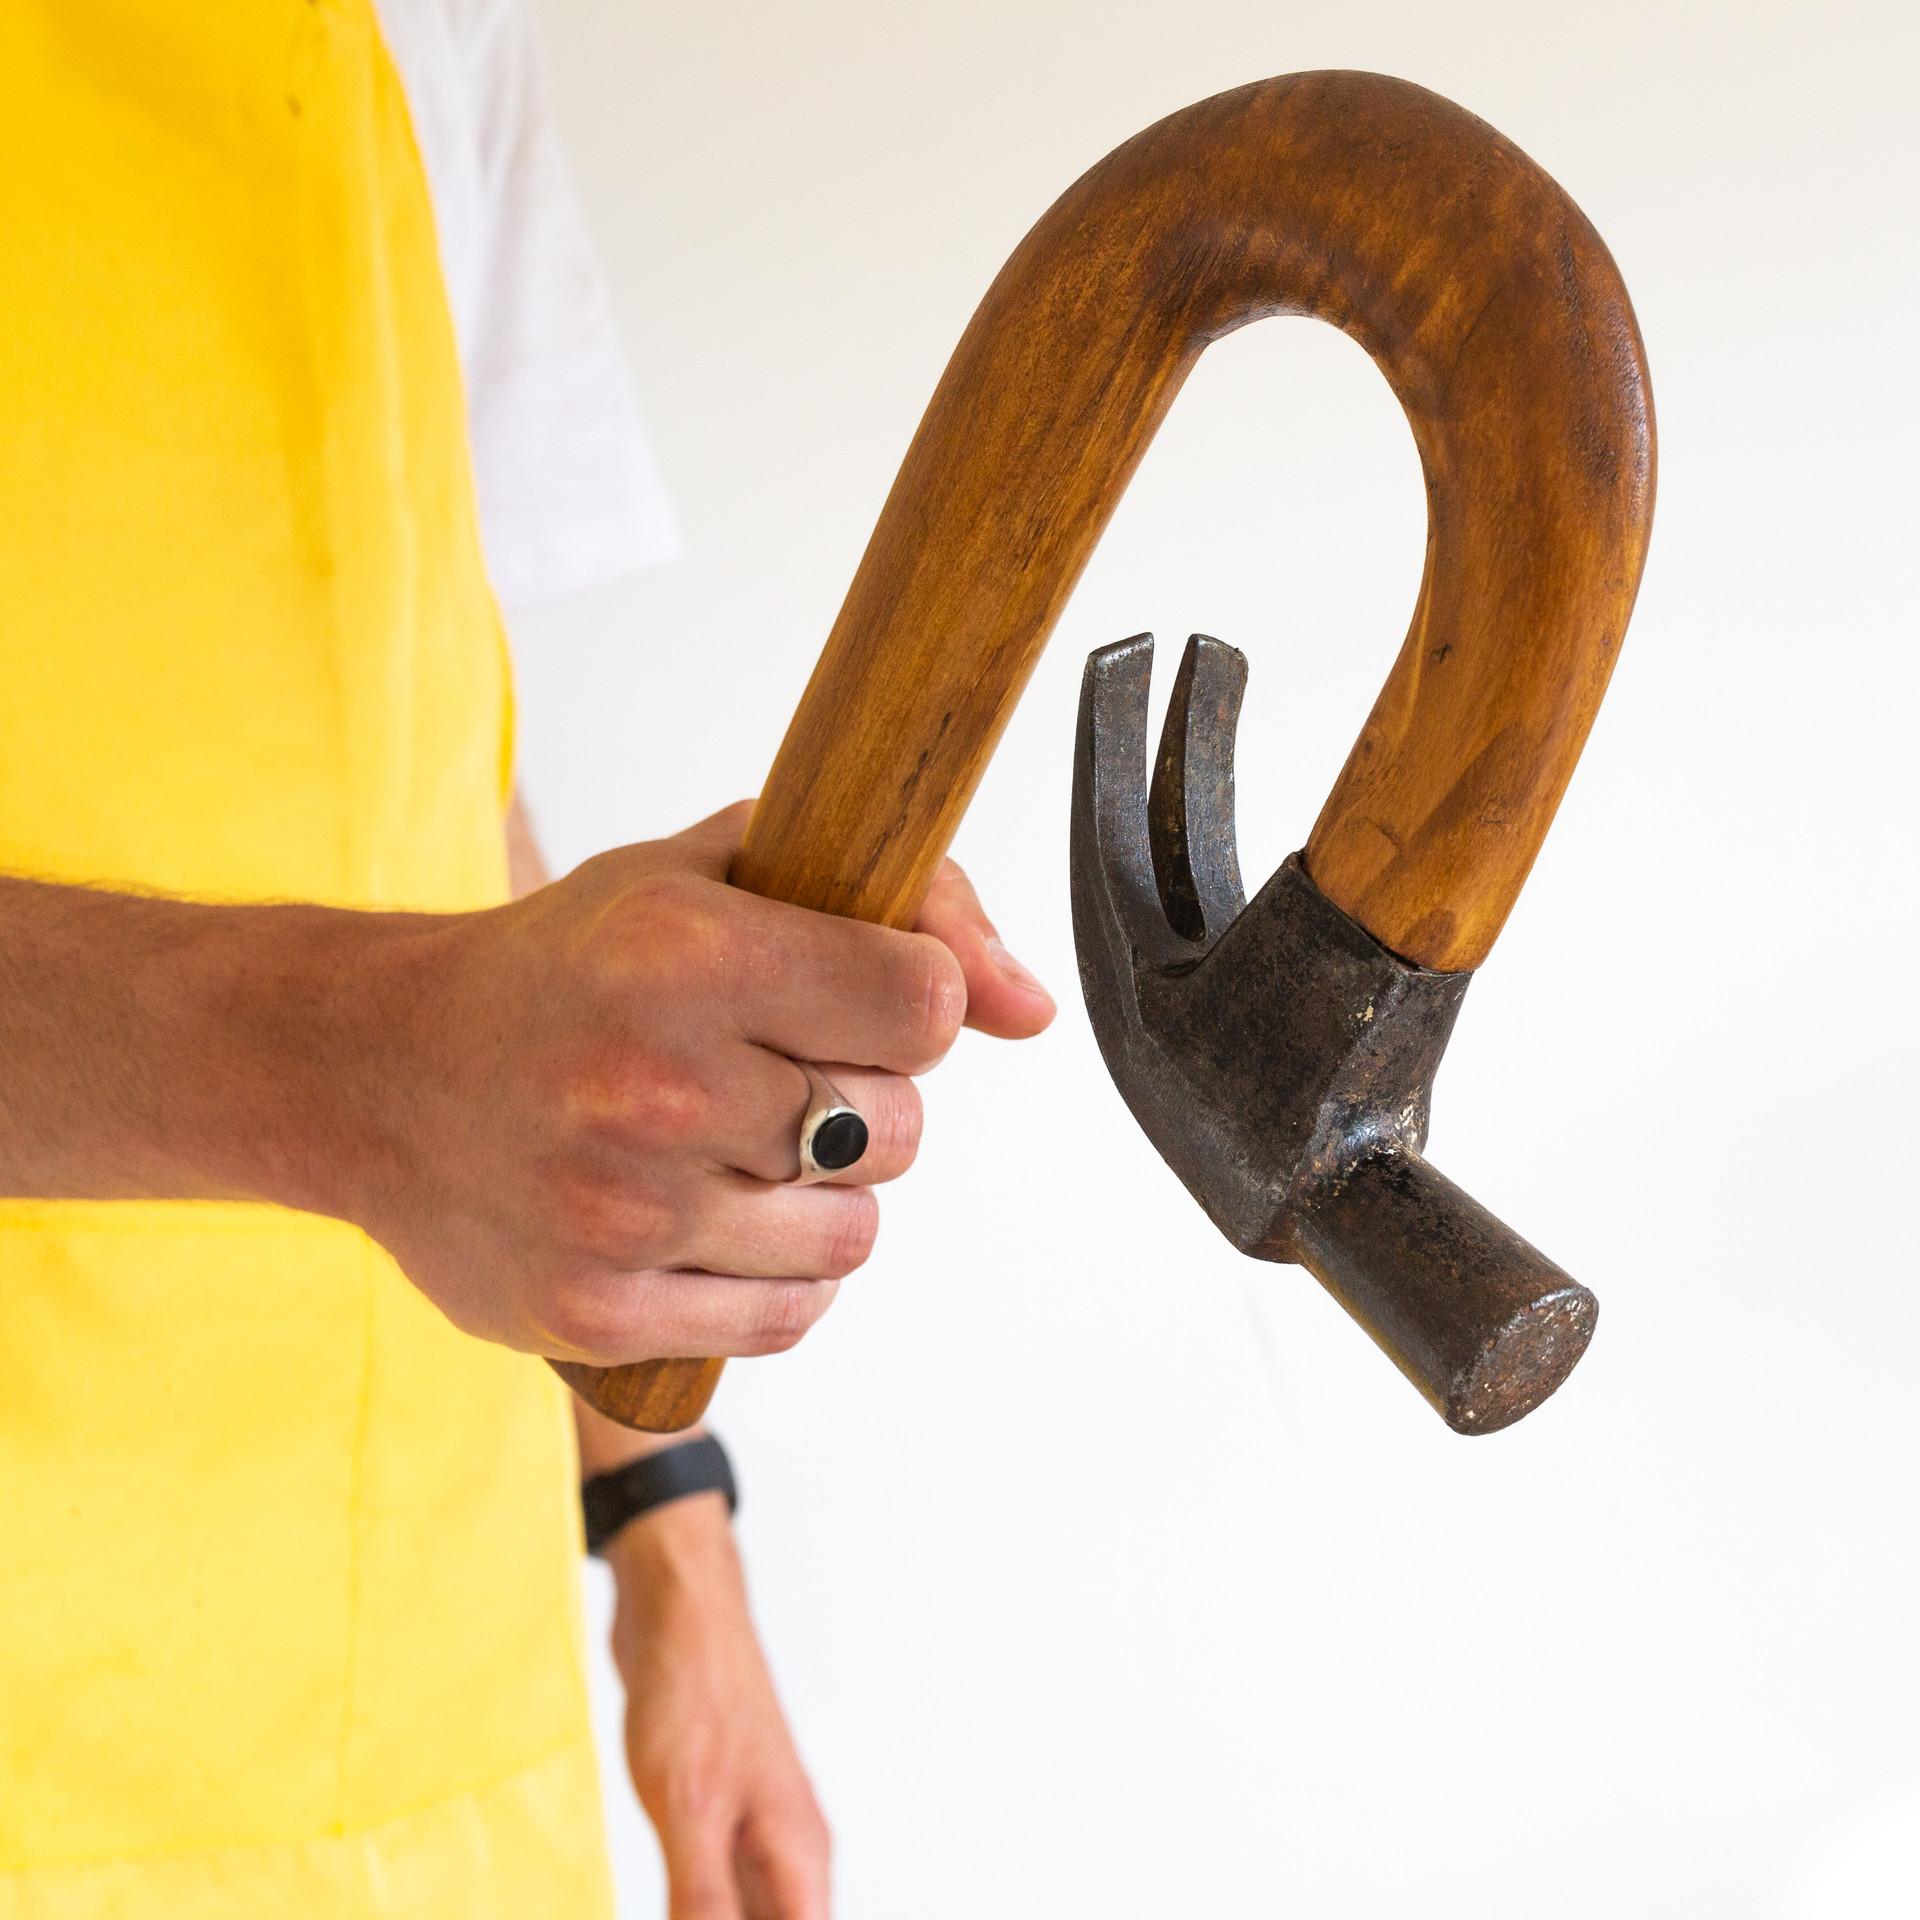 Bendy Hammer-7.jpg